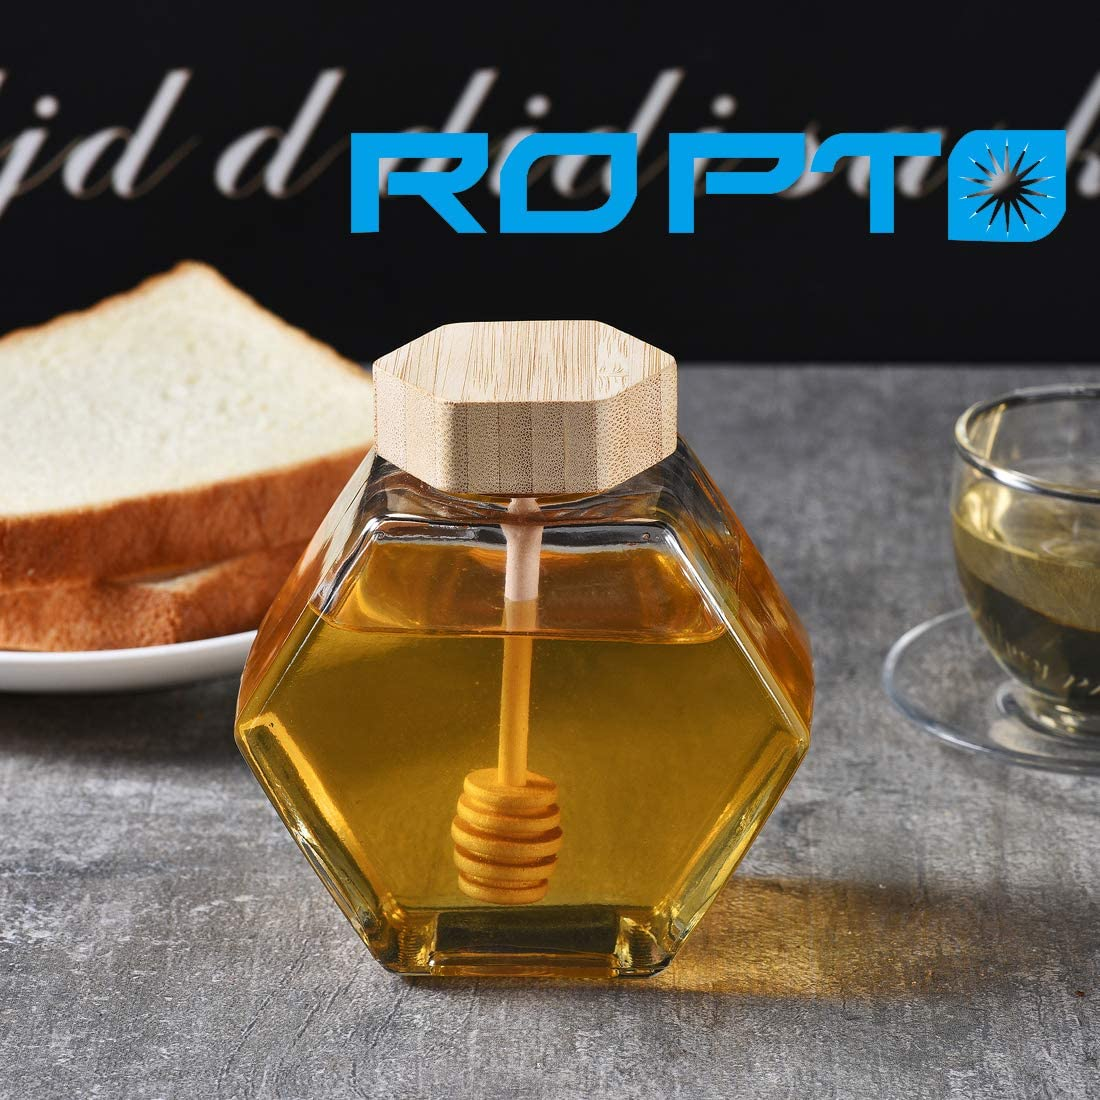 honeycomb Shape Honey Pot Jar with Dipper Heat-Resistant Glass Storage Container Honey Pot Glass Honey Jar with Dipper and Lid Cover for Home Kitchen